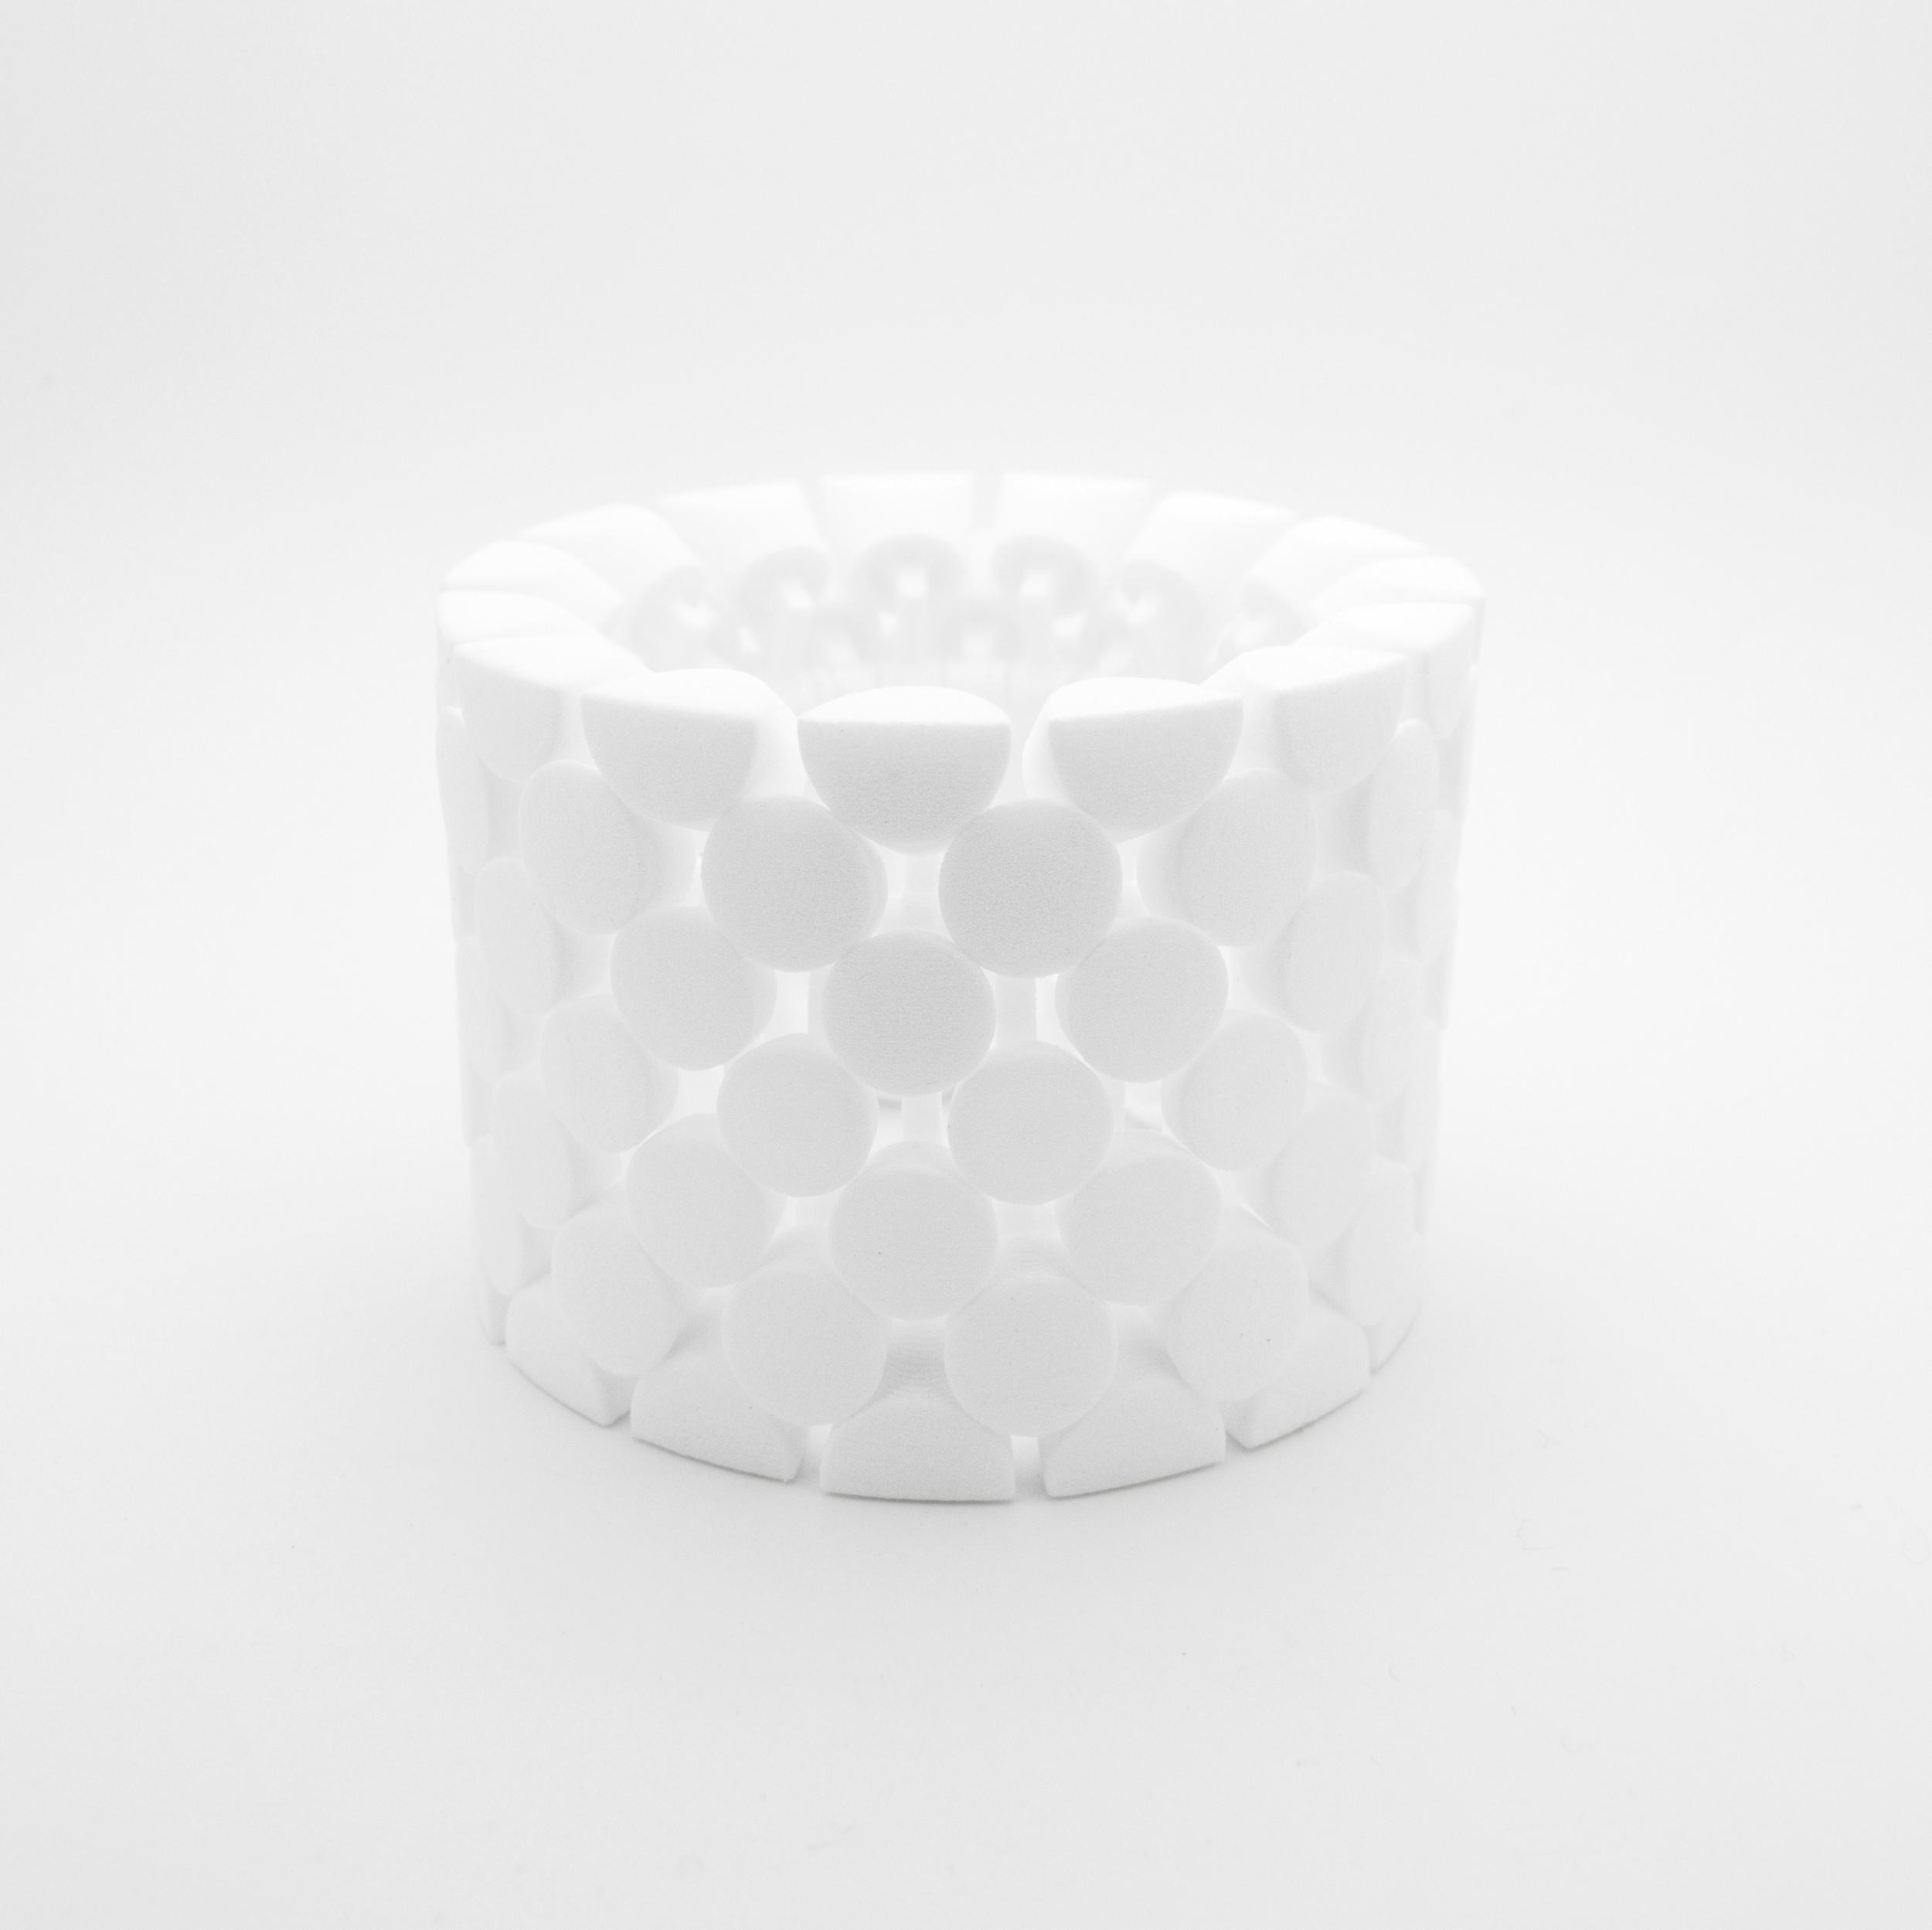 3D print, nylon